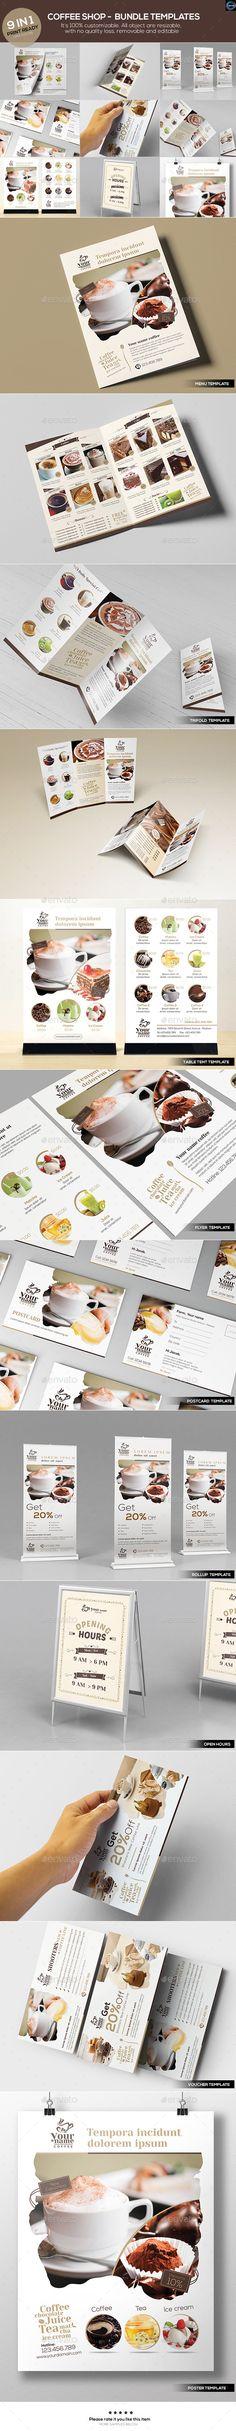 Coffee Shop - Bundle Template #design Download: http://graphicriver.net/item/coffee-shop-bundle-templates/12527338?ref=ksioks